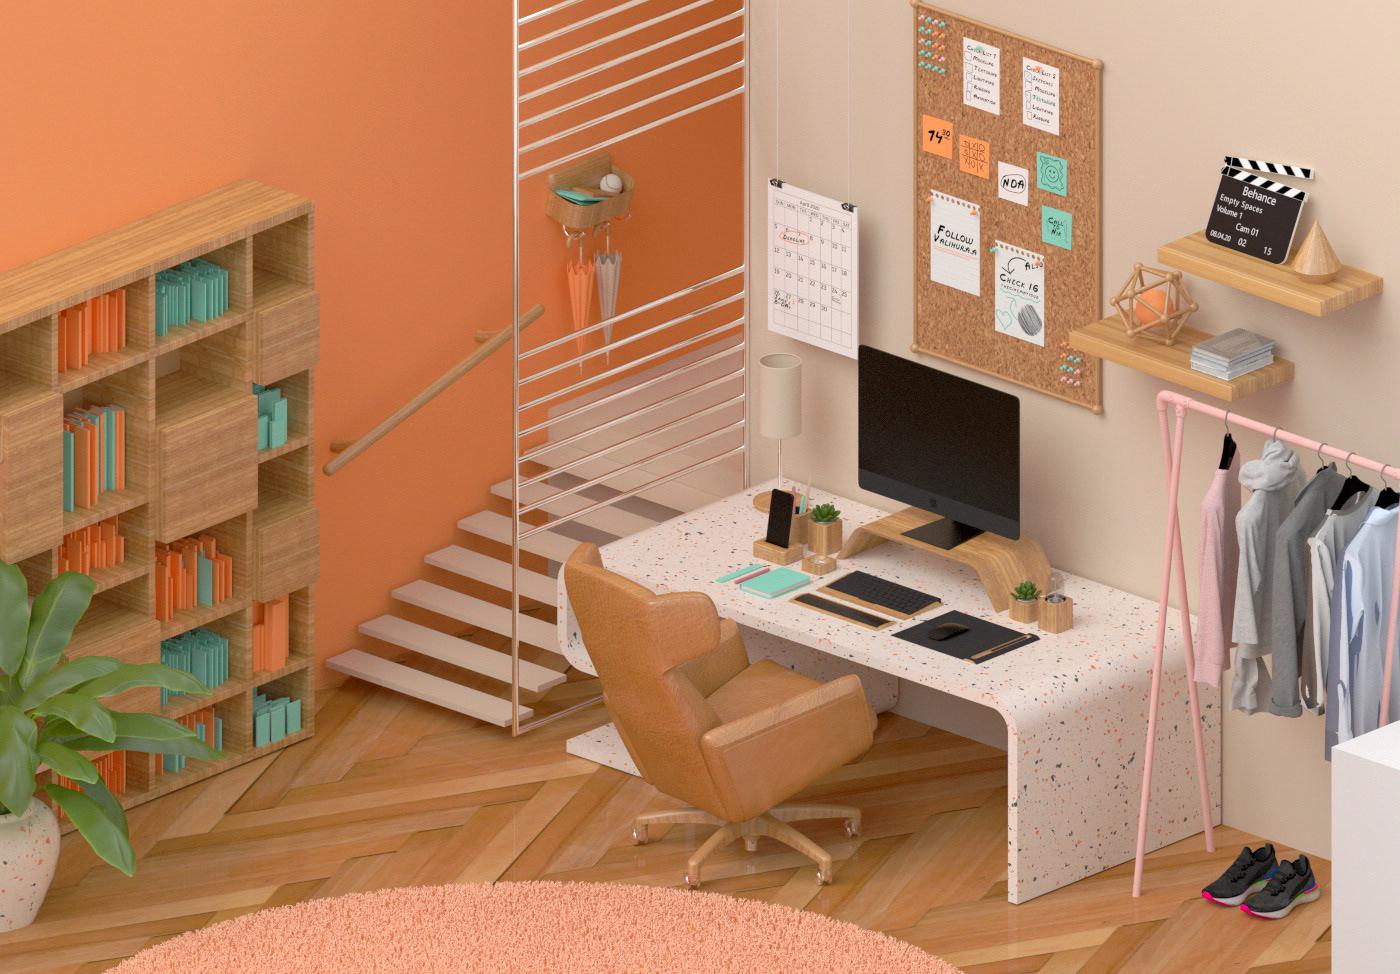 3d art 3D illustrations cinema 4d design Digital Art  Isometric museum Office Render studio